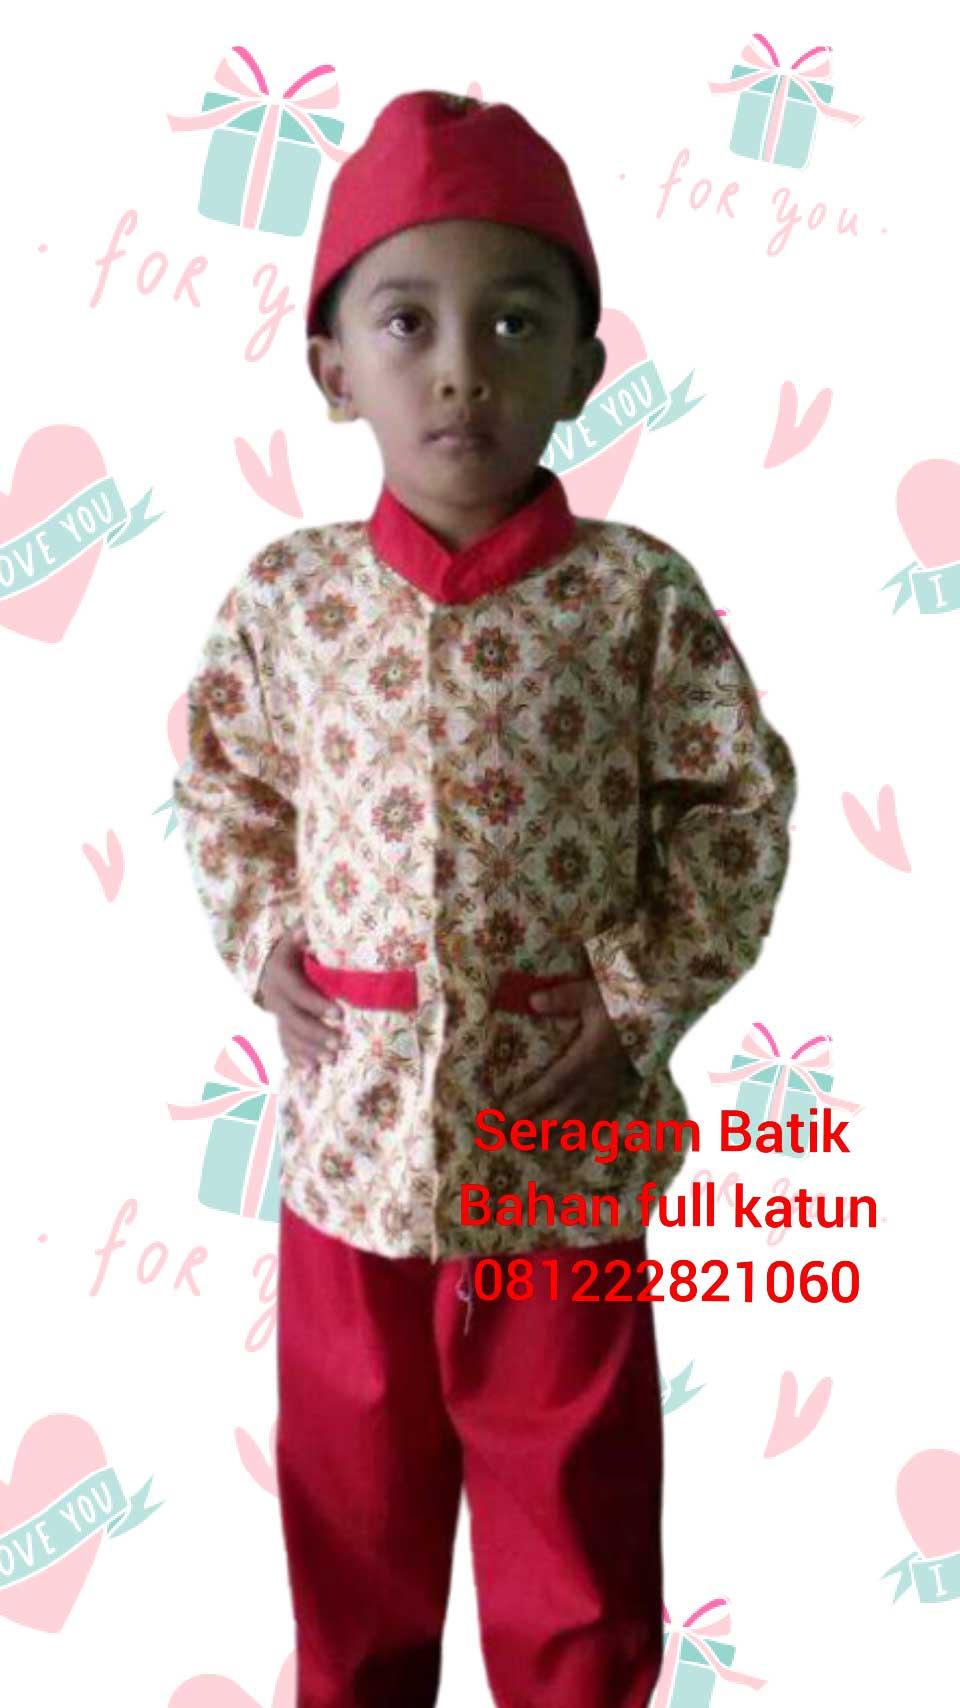 gambar seragam sekolah tk berkualitas Gunung Kaler Kab. Tangerang